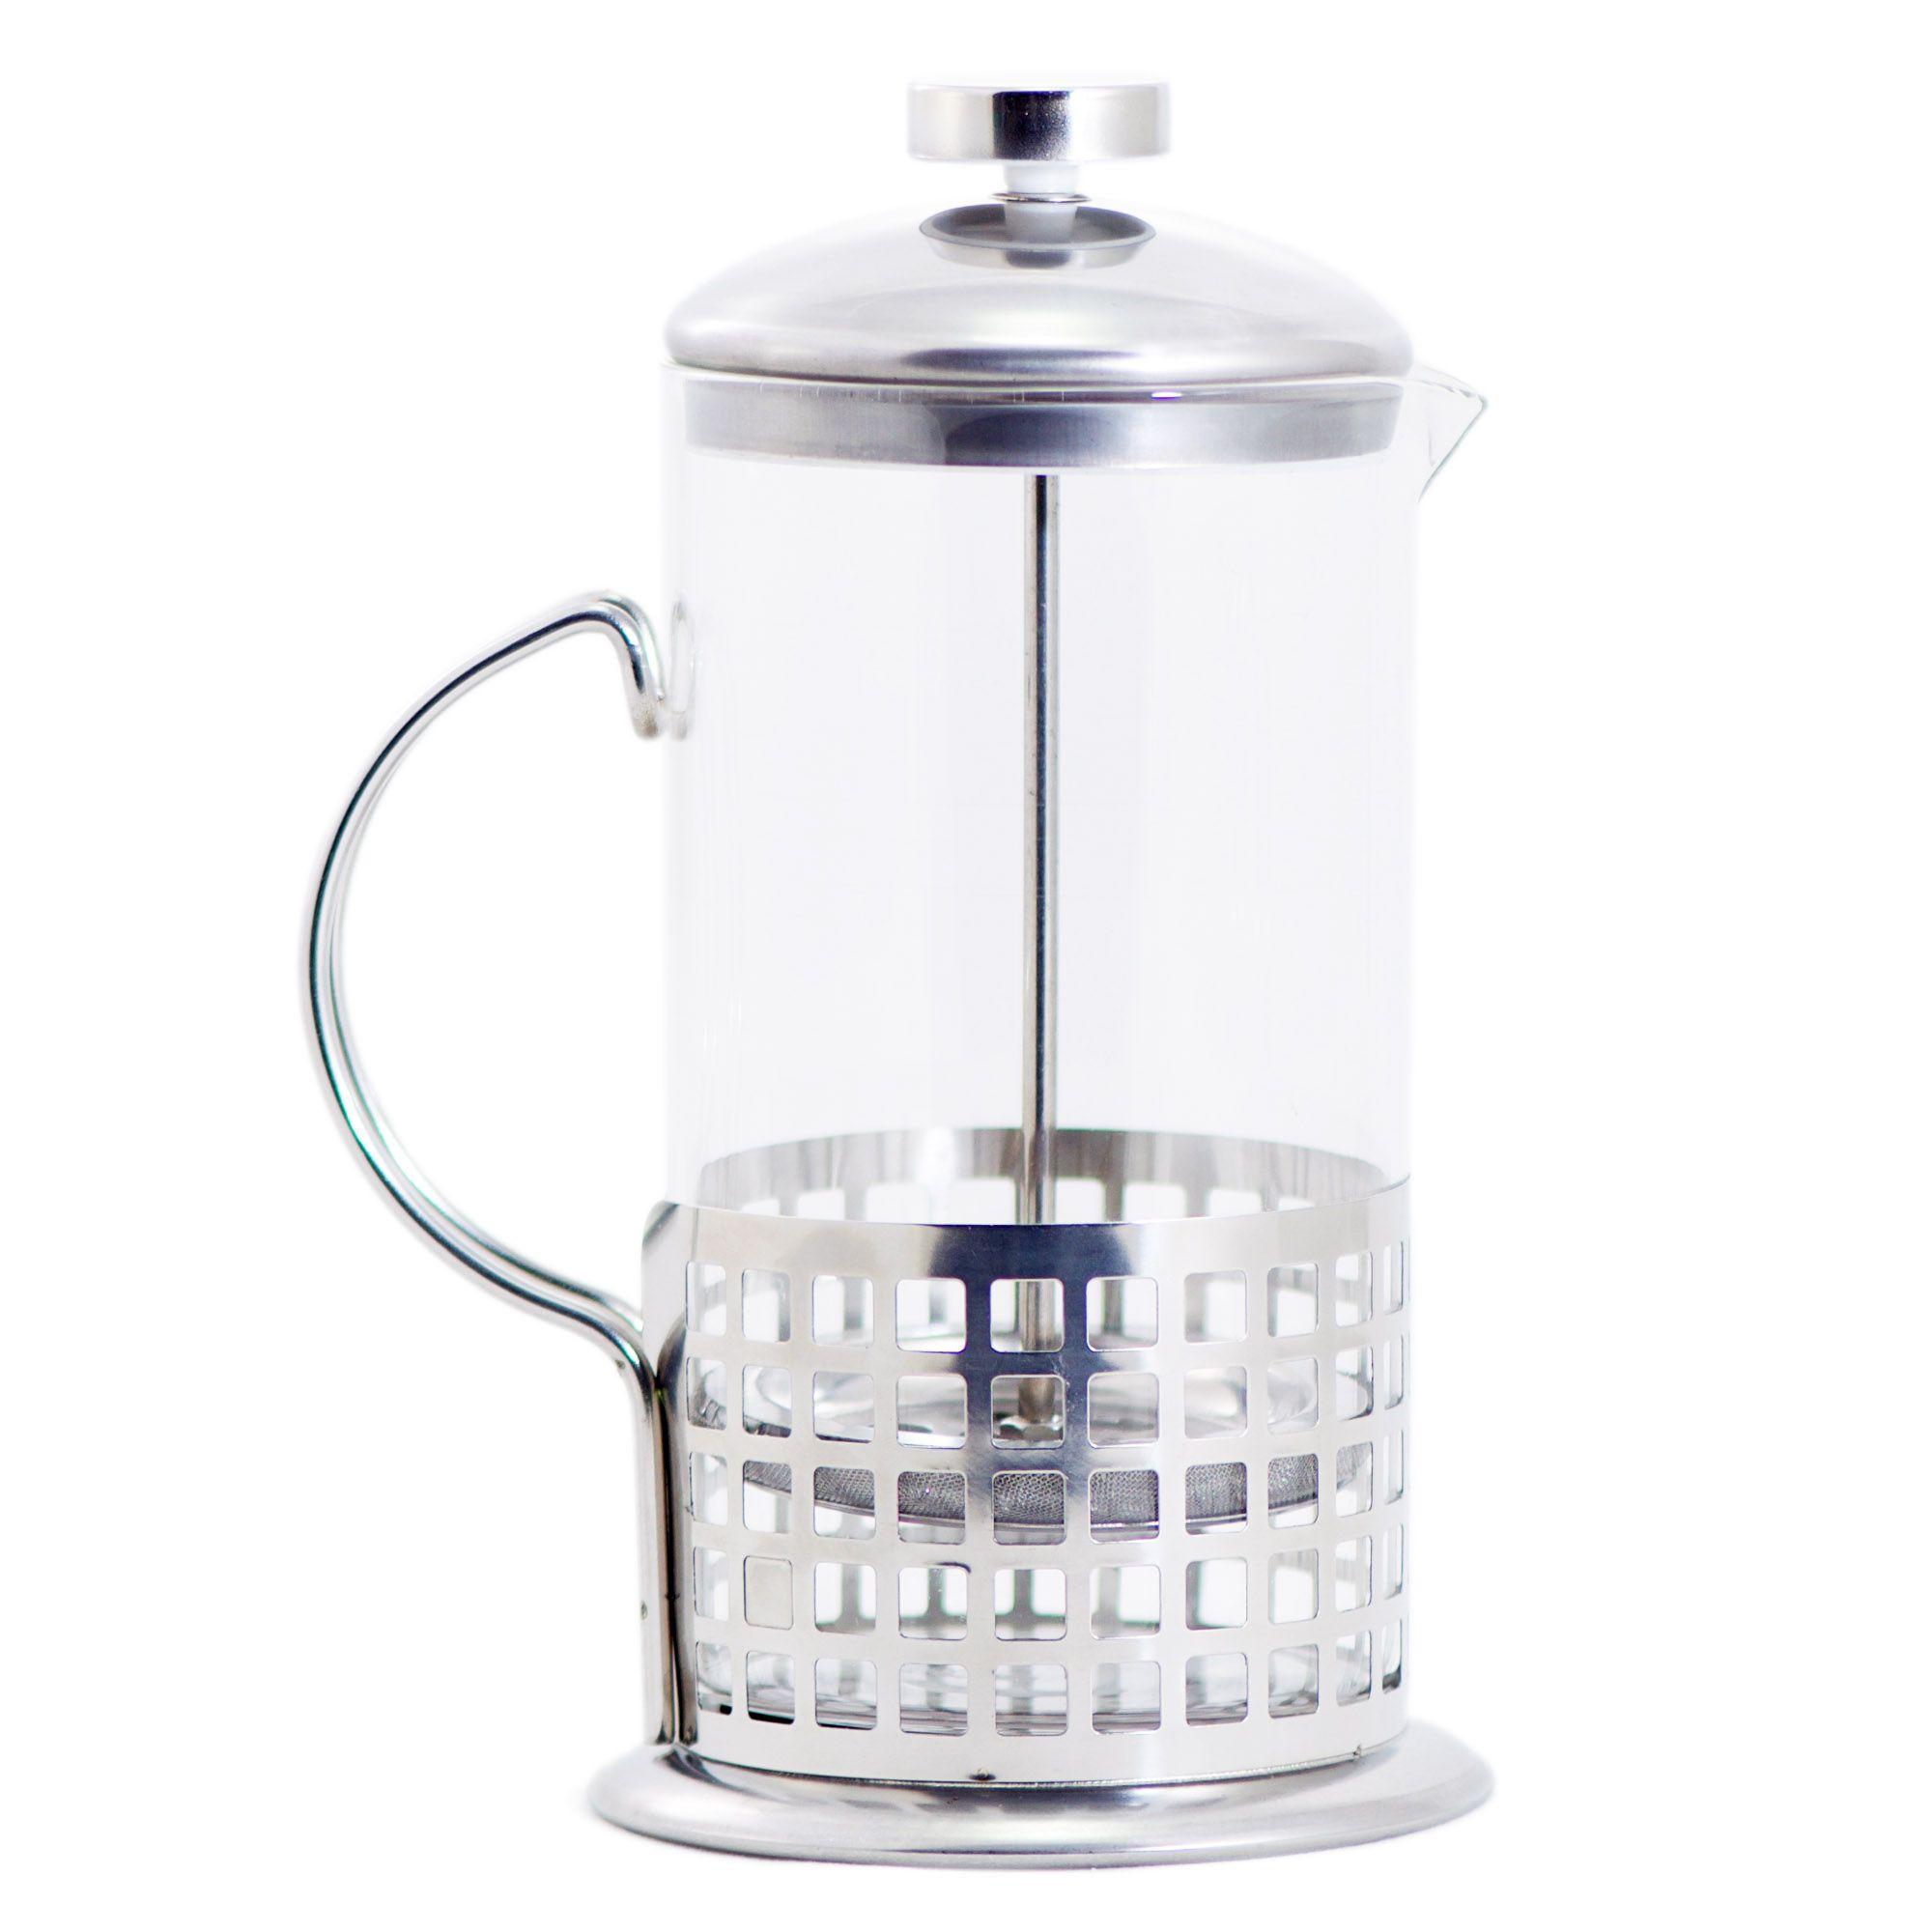 Cafeteira de vidro French Press 1L - Simplicity - Bialetti